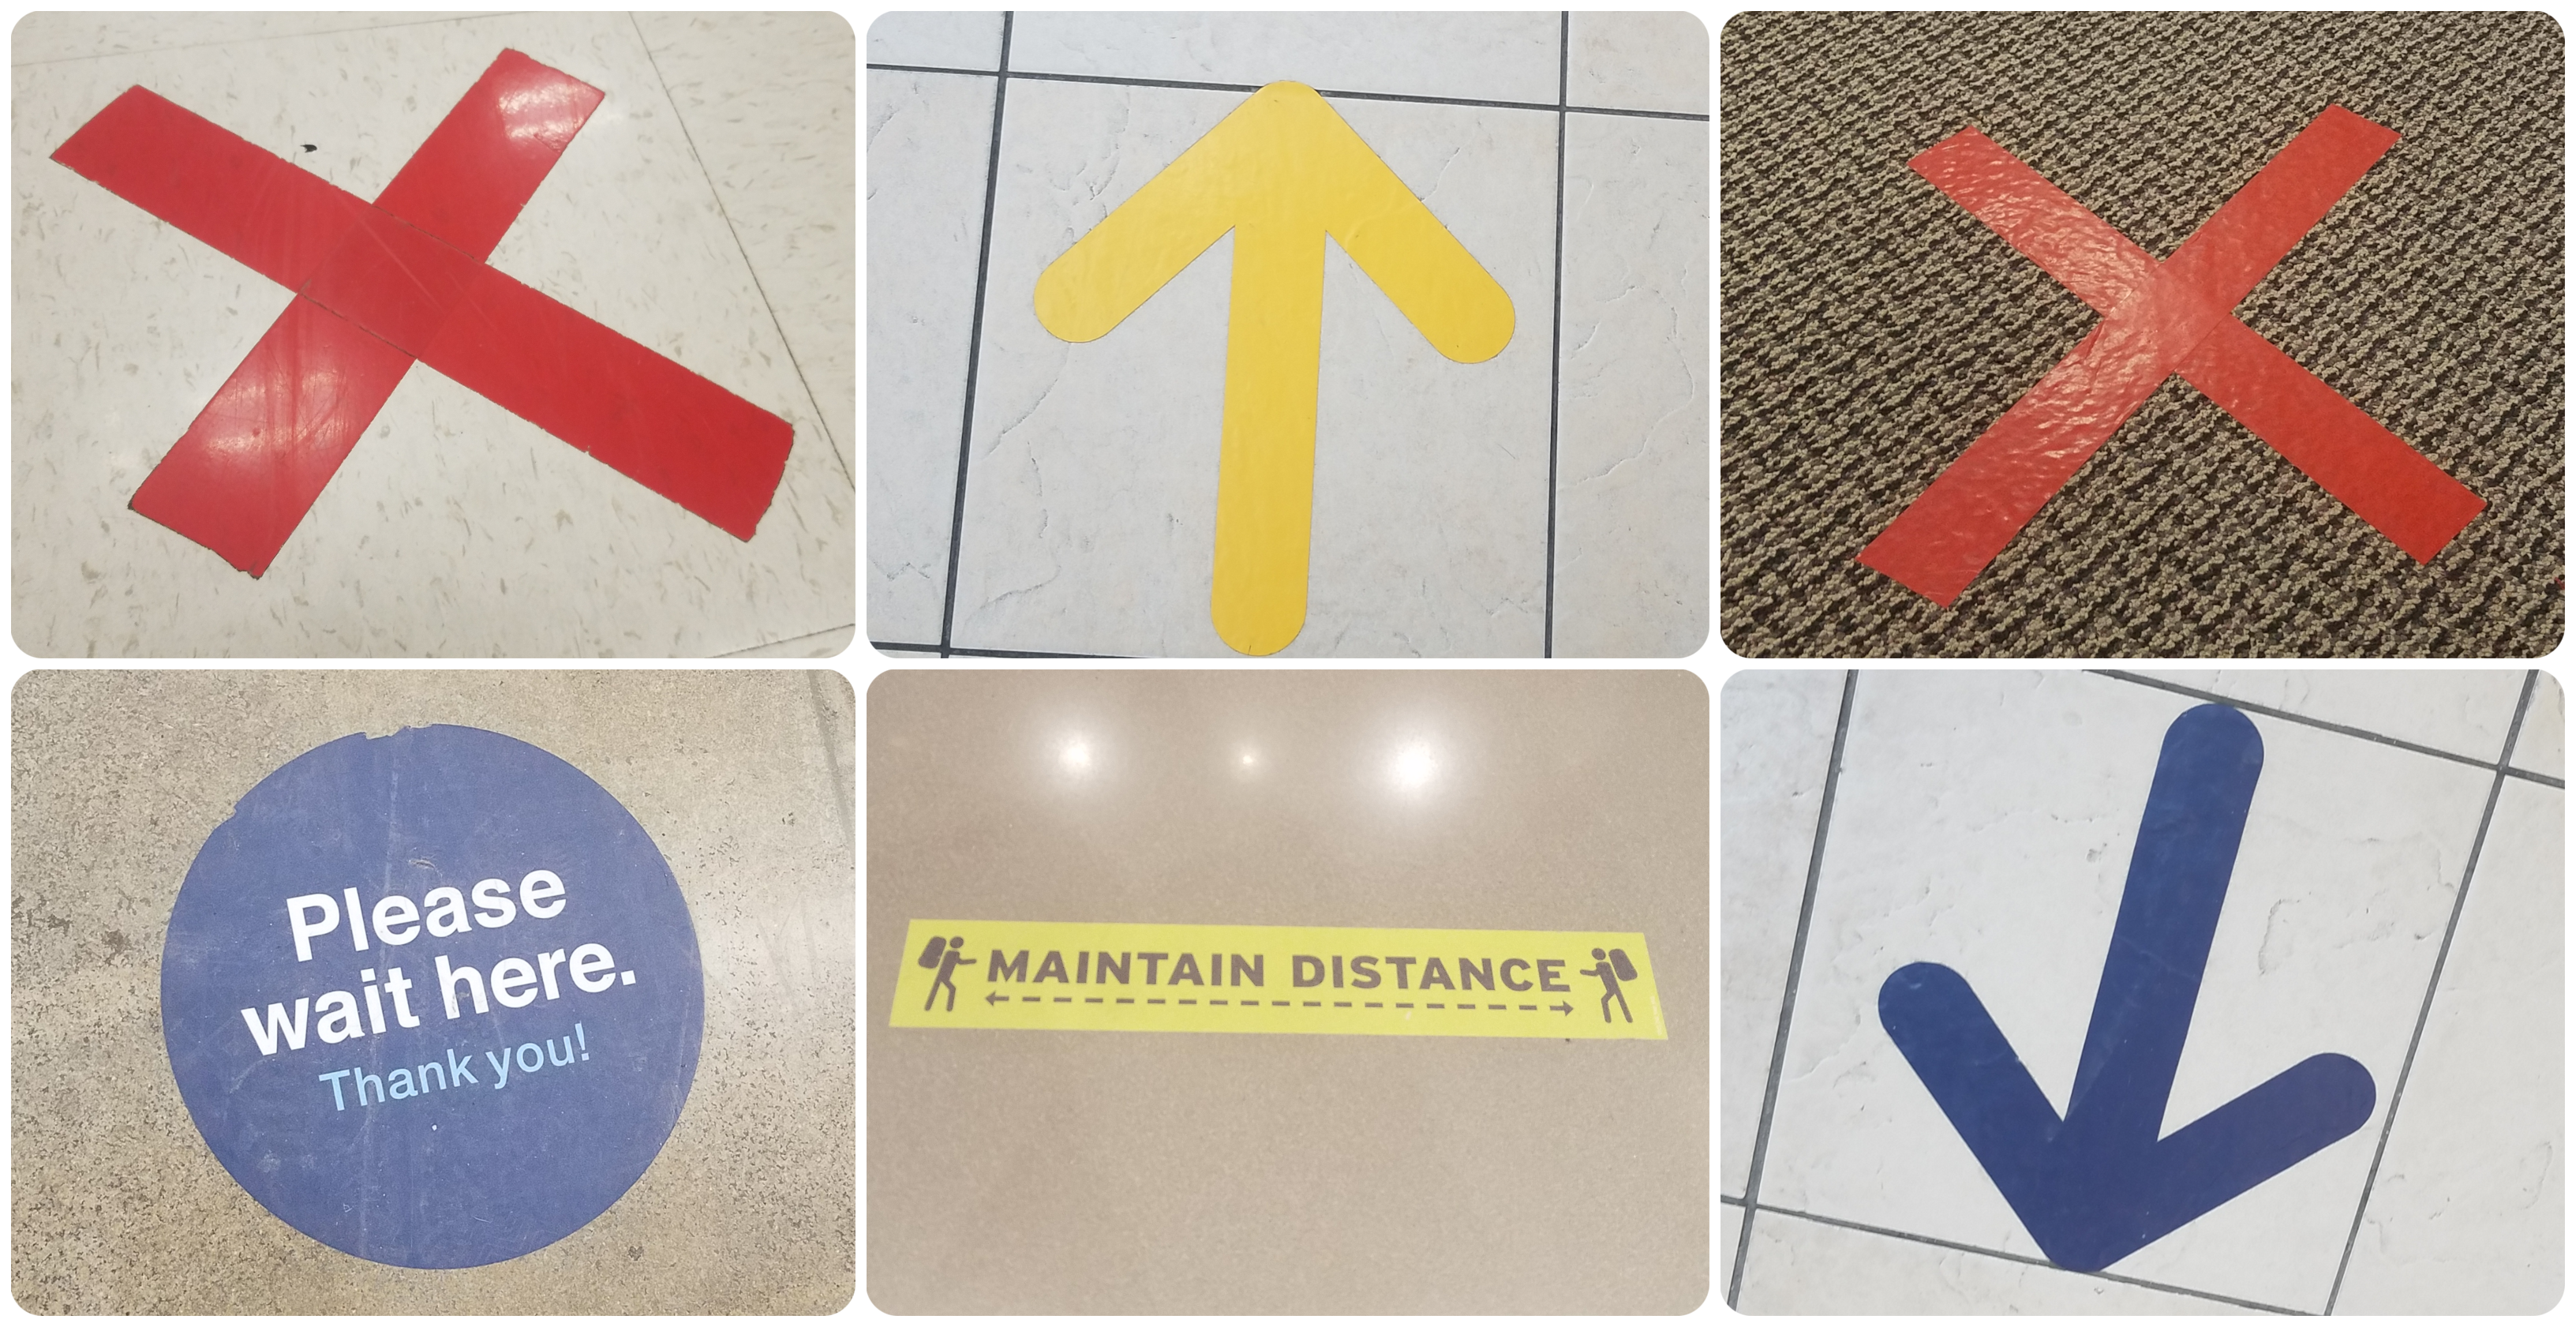 Bad Examples of Floor Graphics